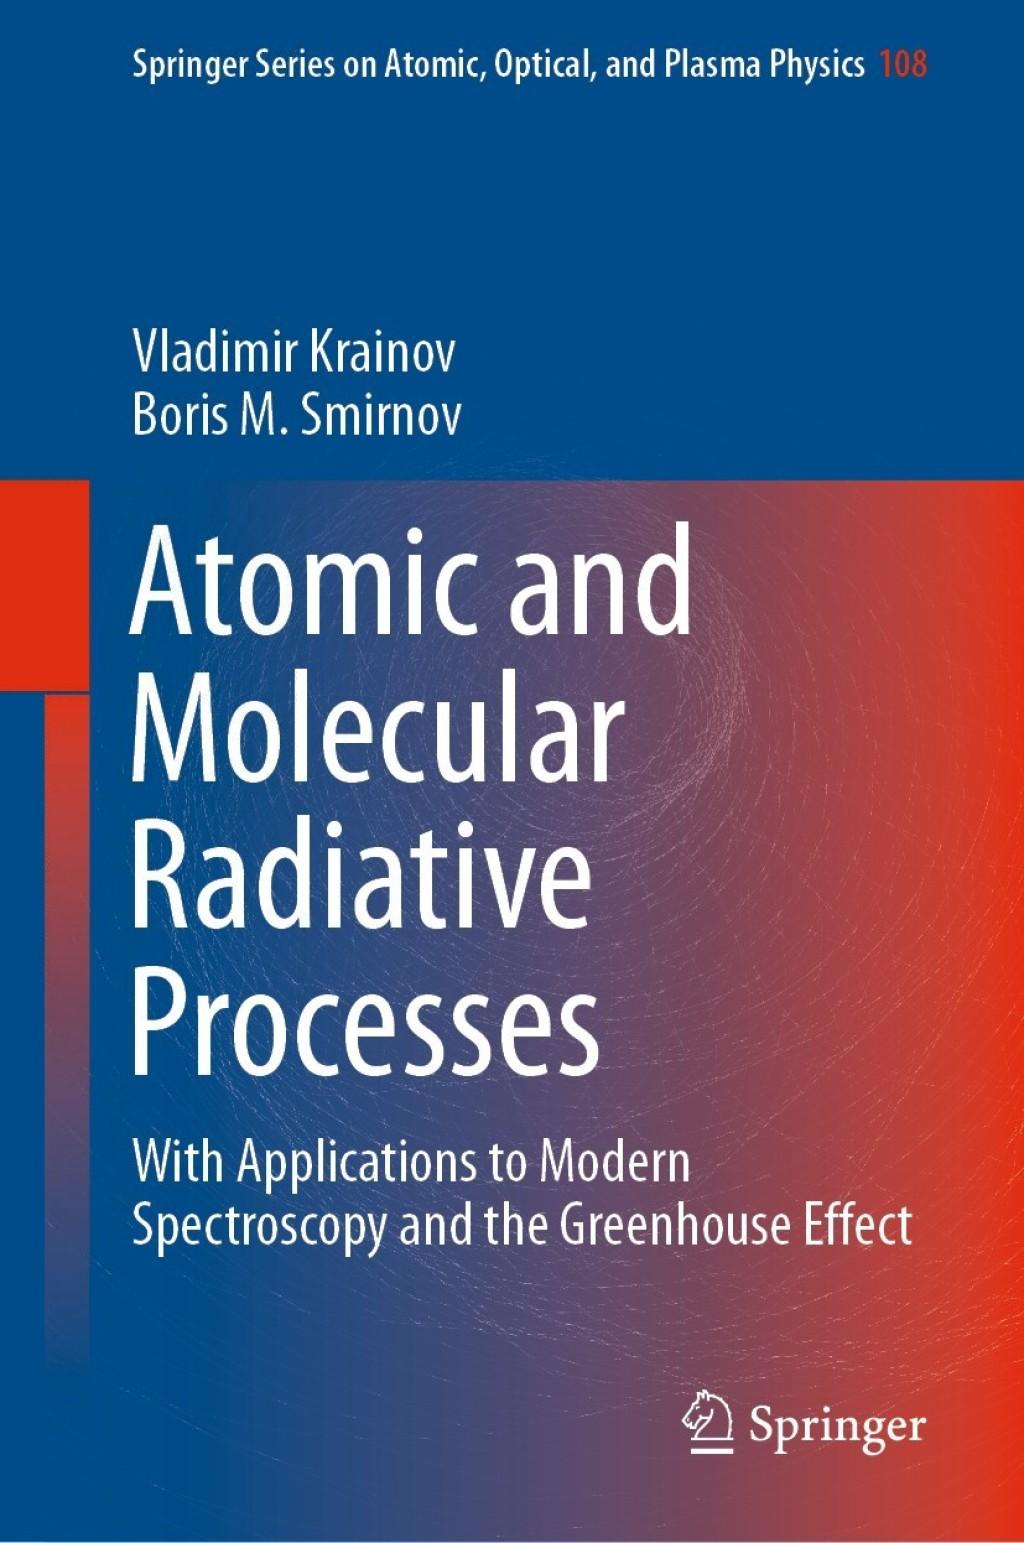 Atomic and Molecular Radiative Processes (eBook) - Vladimir Krainov; Boris M. Smirnov